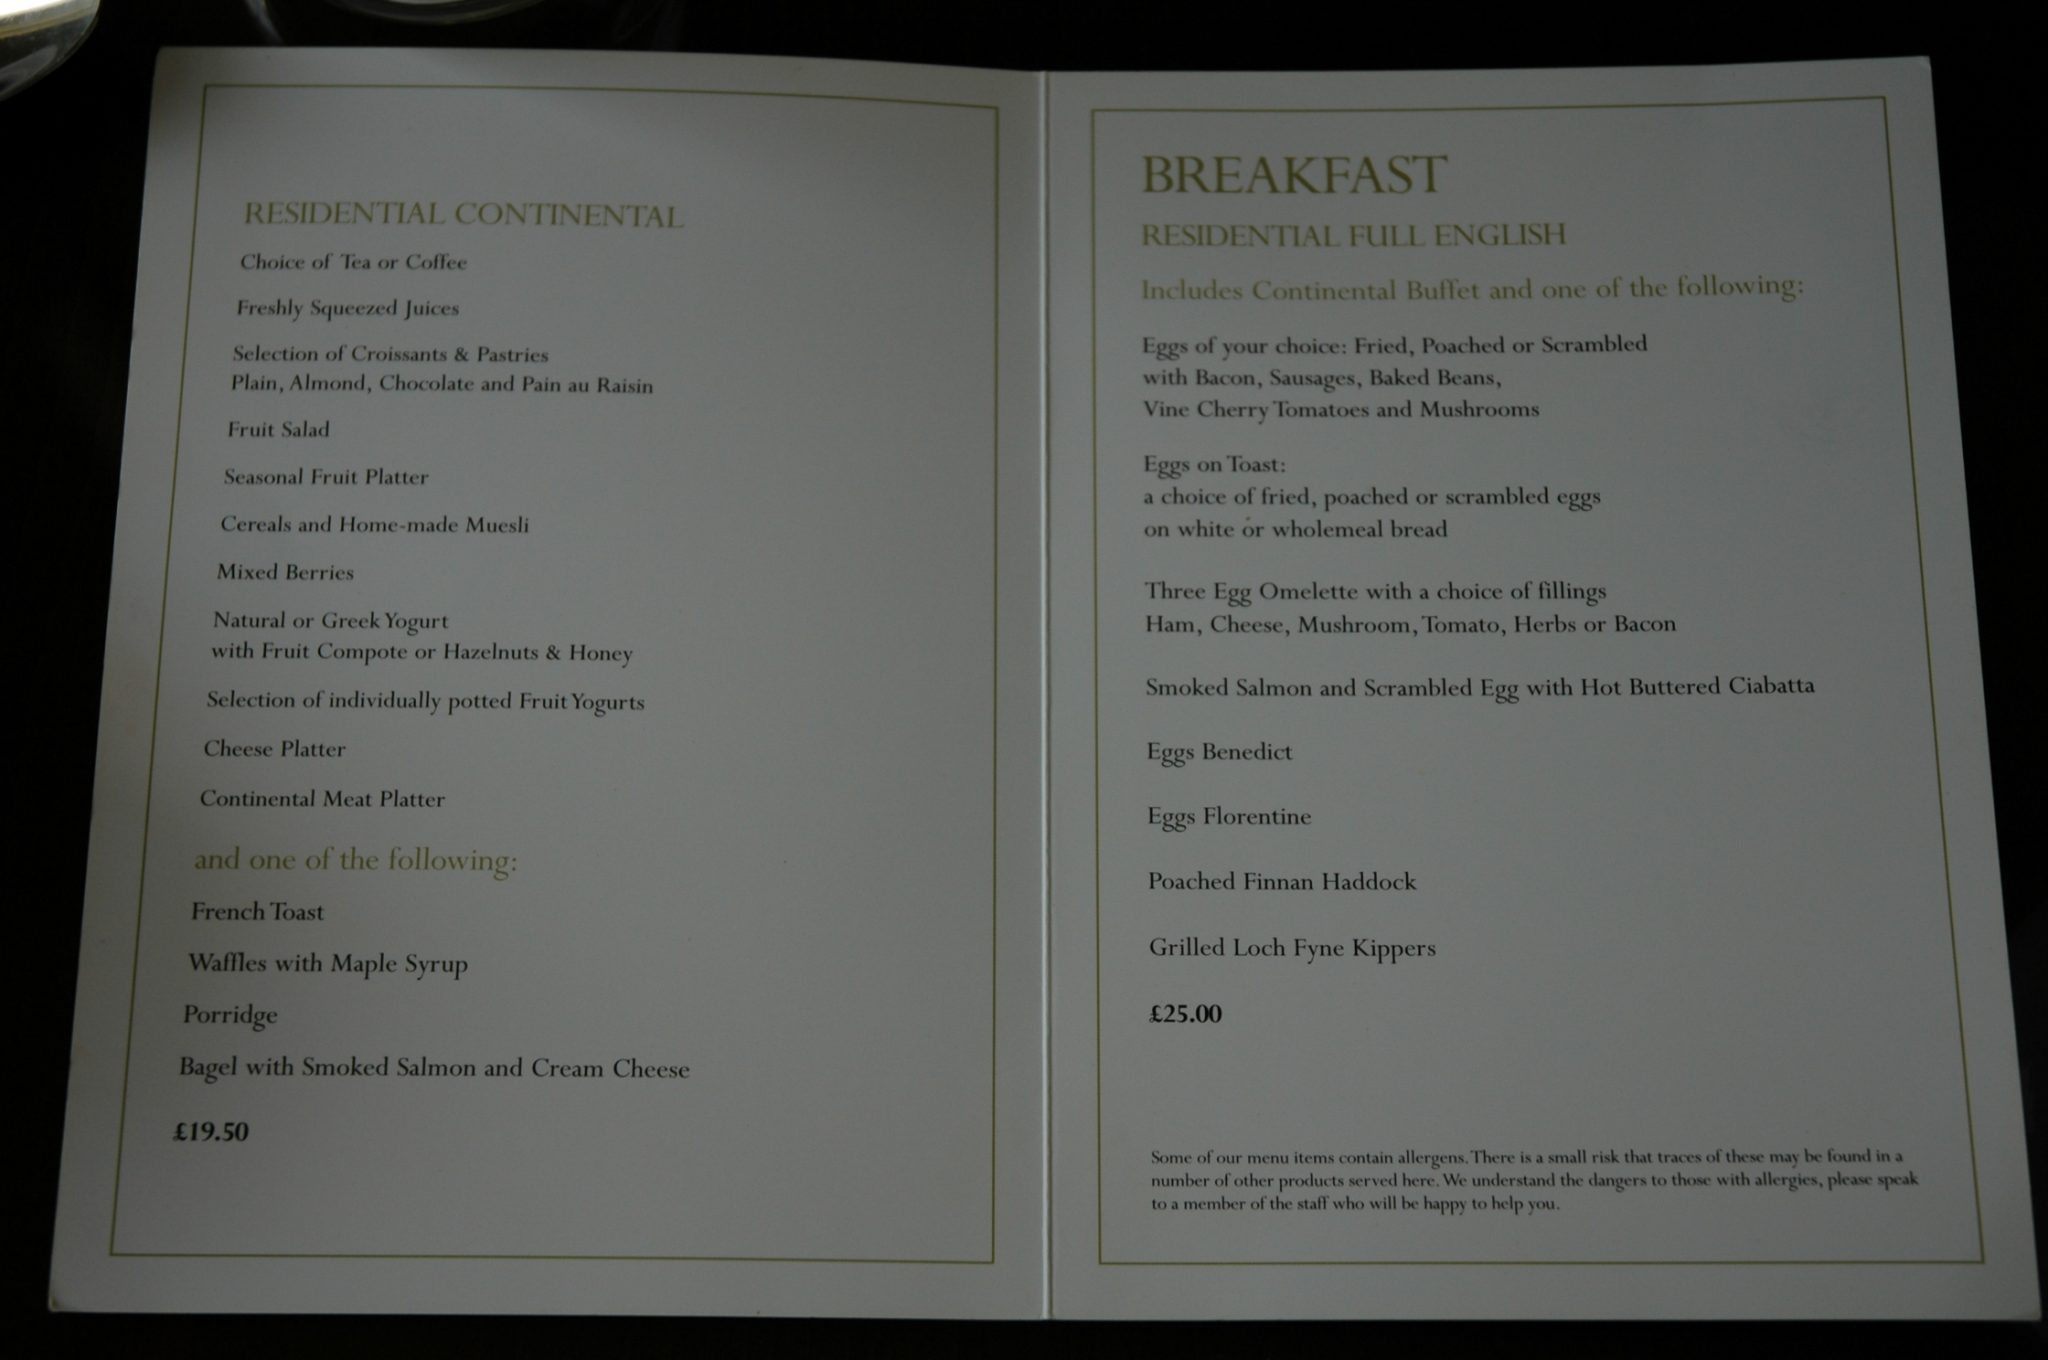 A la carte breakfast menu